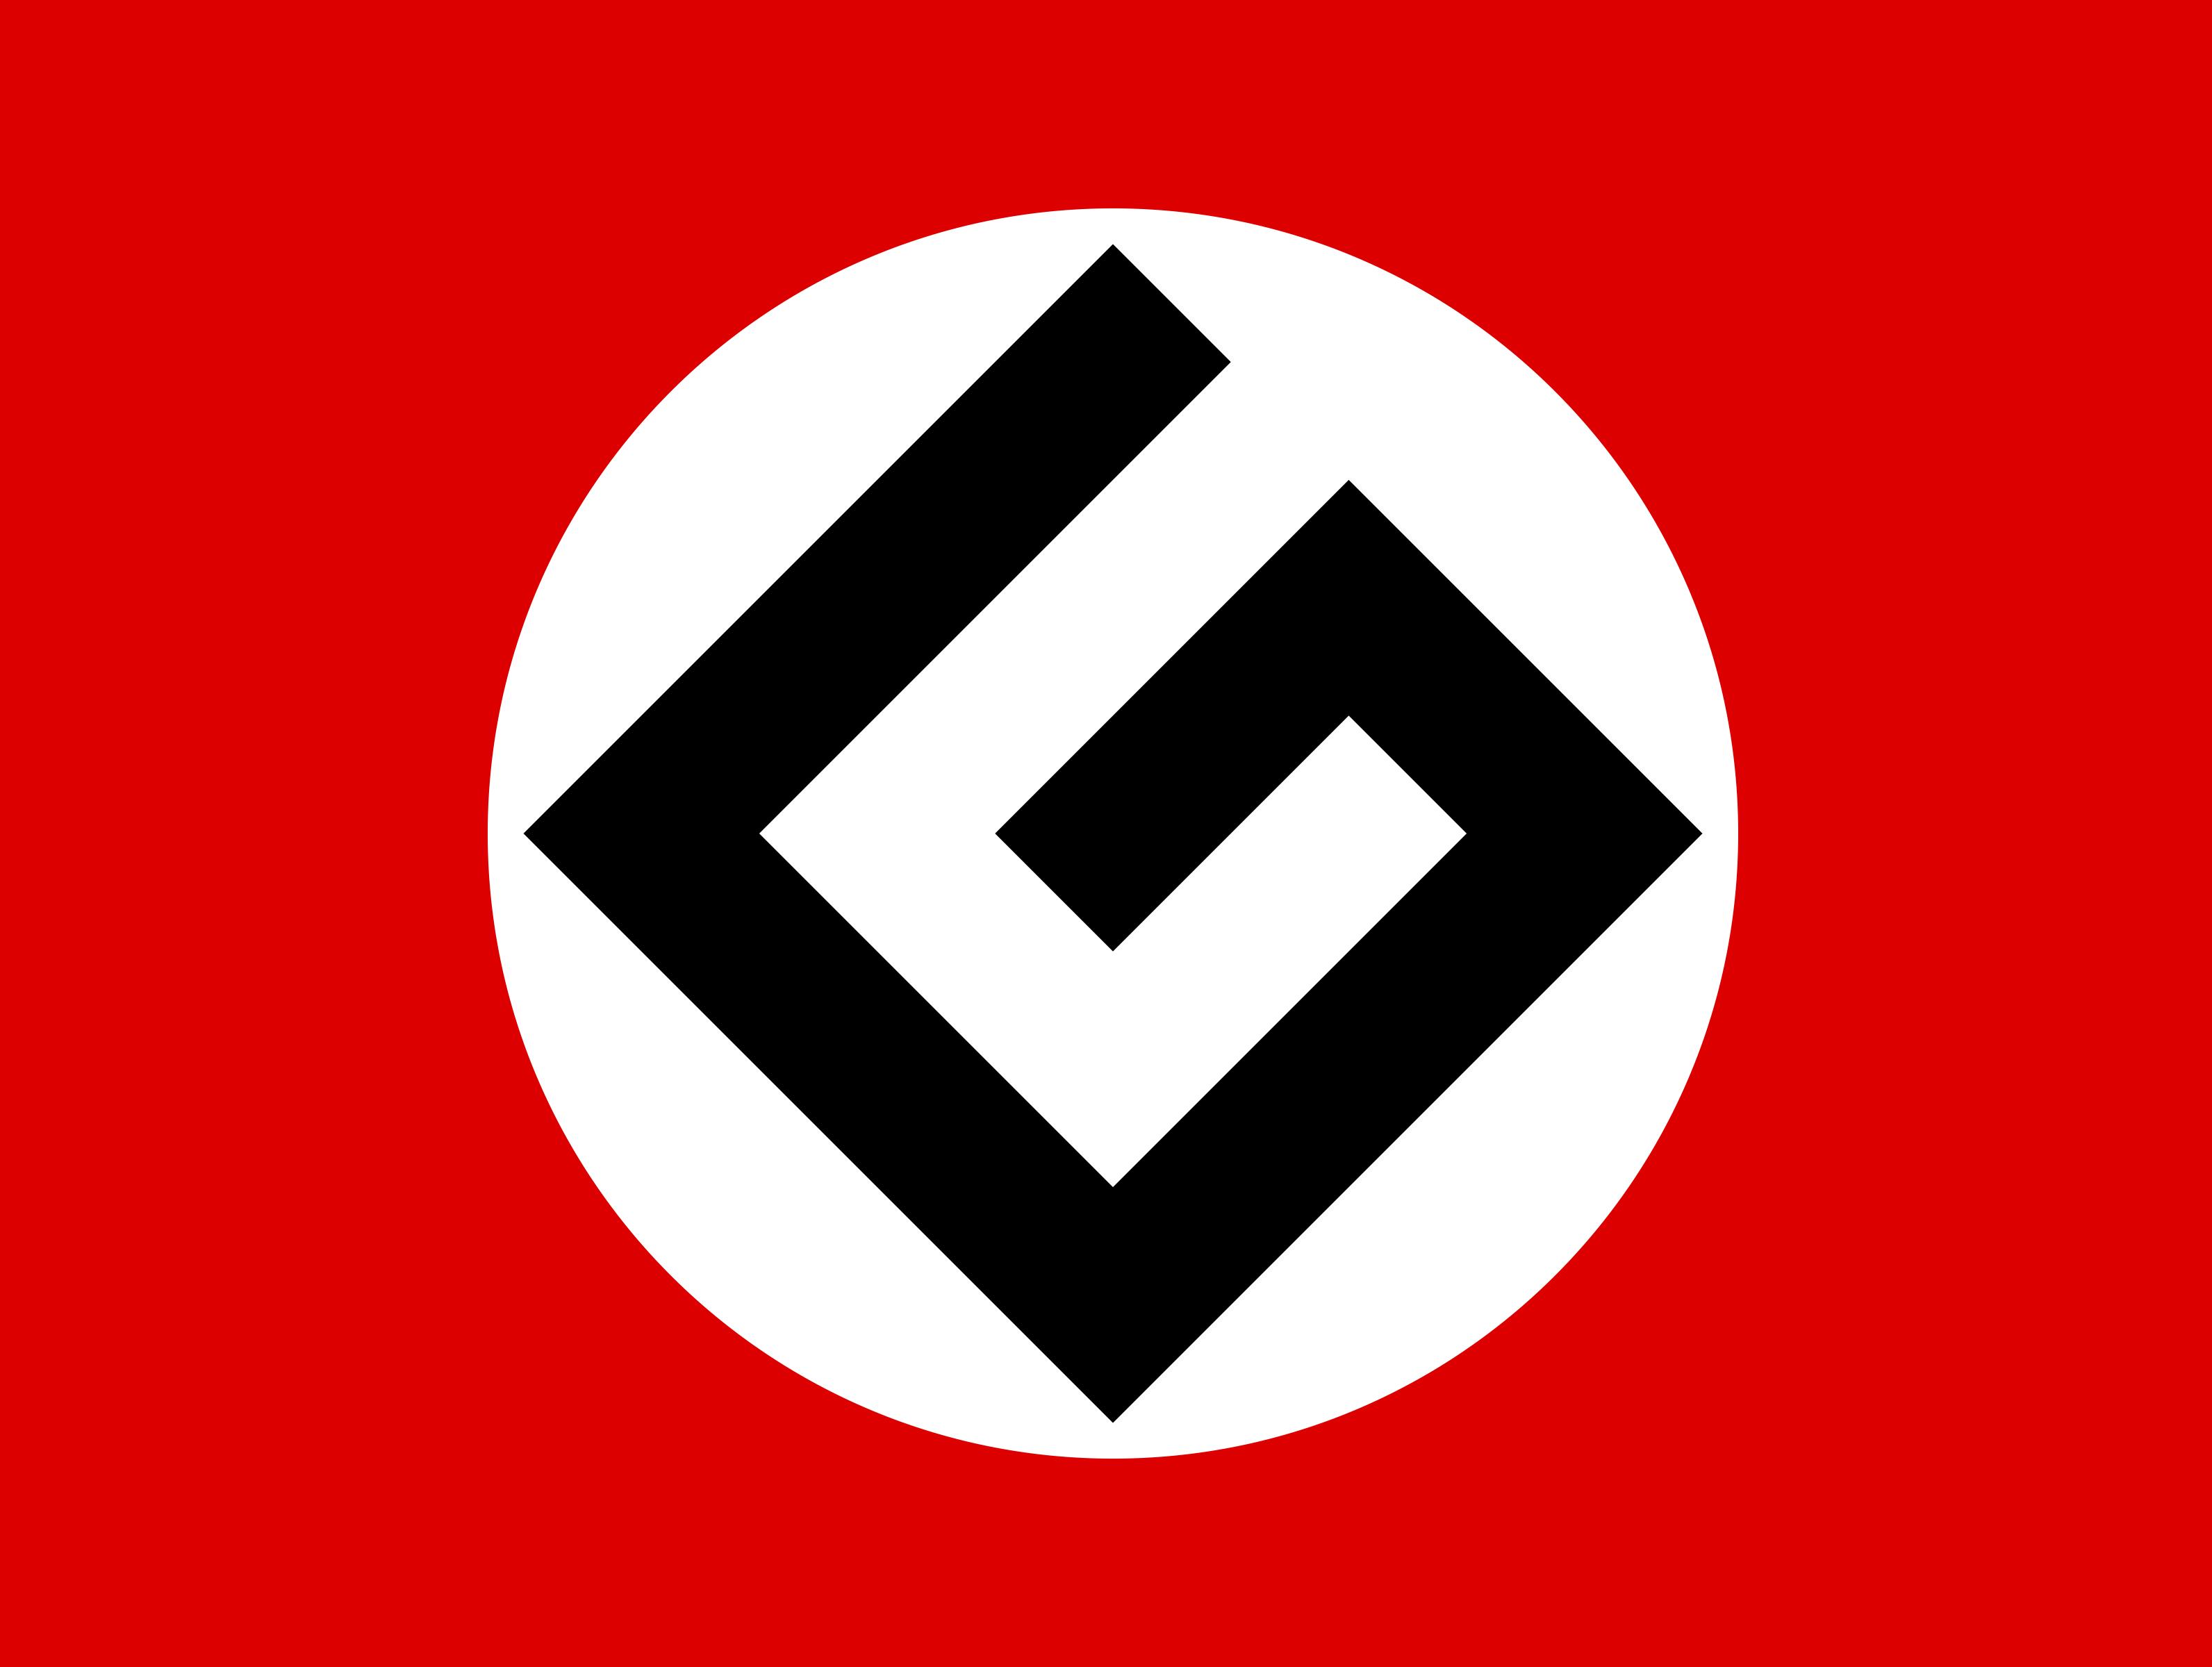 Sticker jvc grammar nazi bescherelle orthographe conjugaison vocabulaire